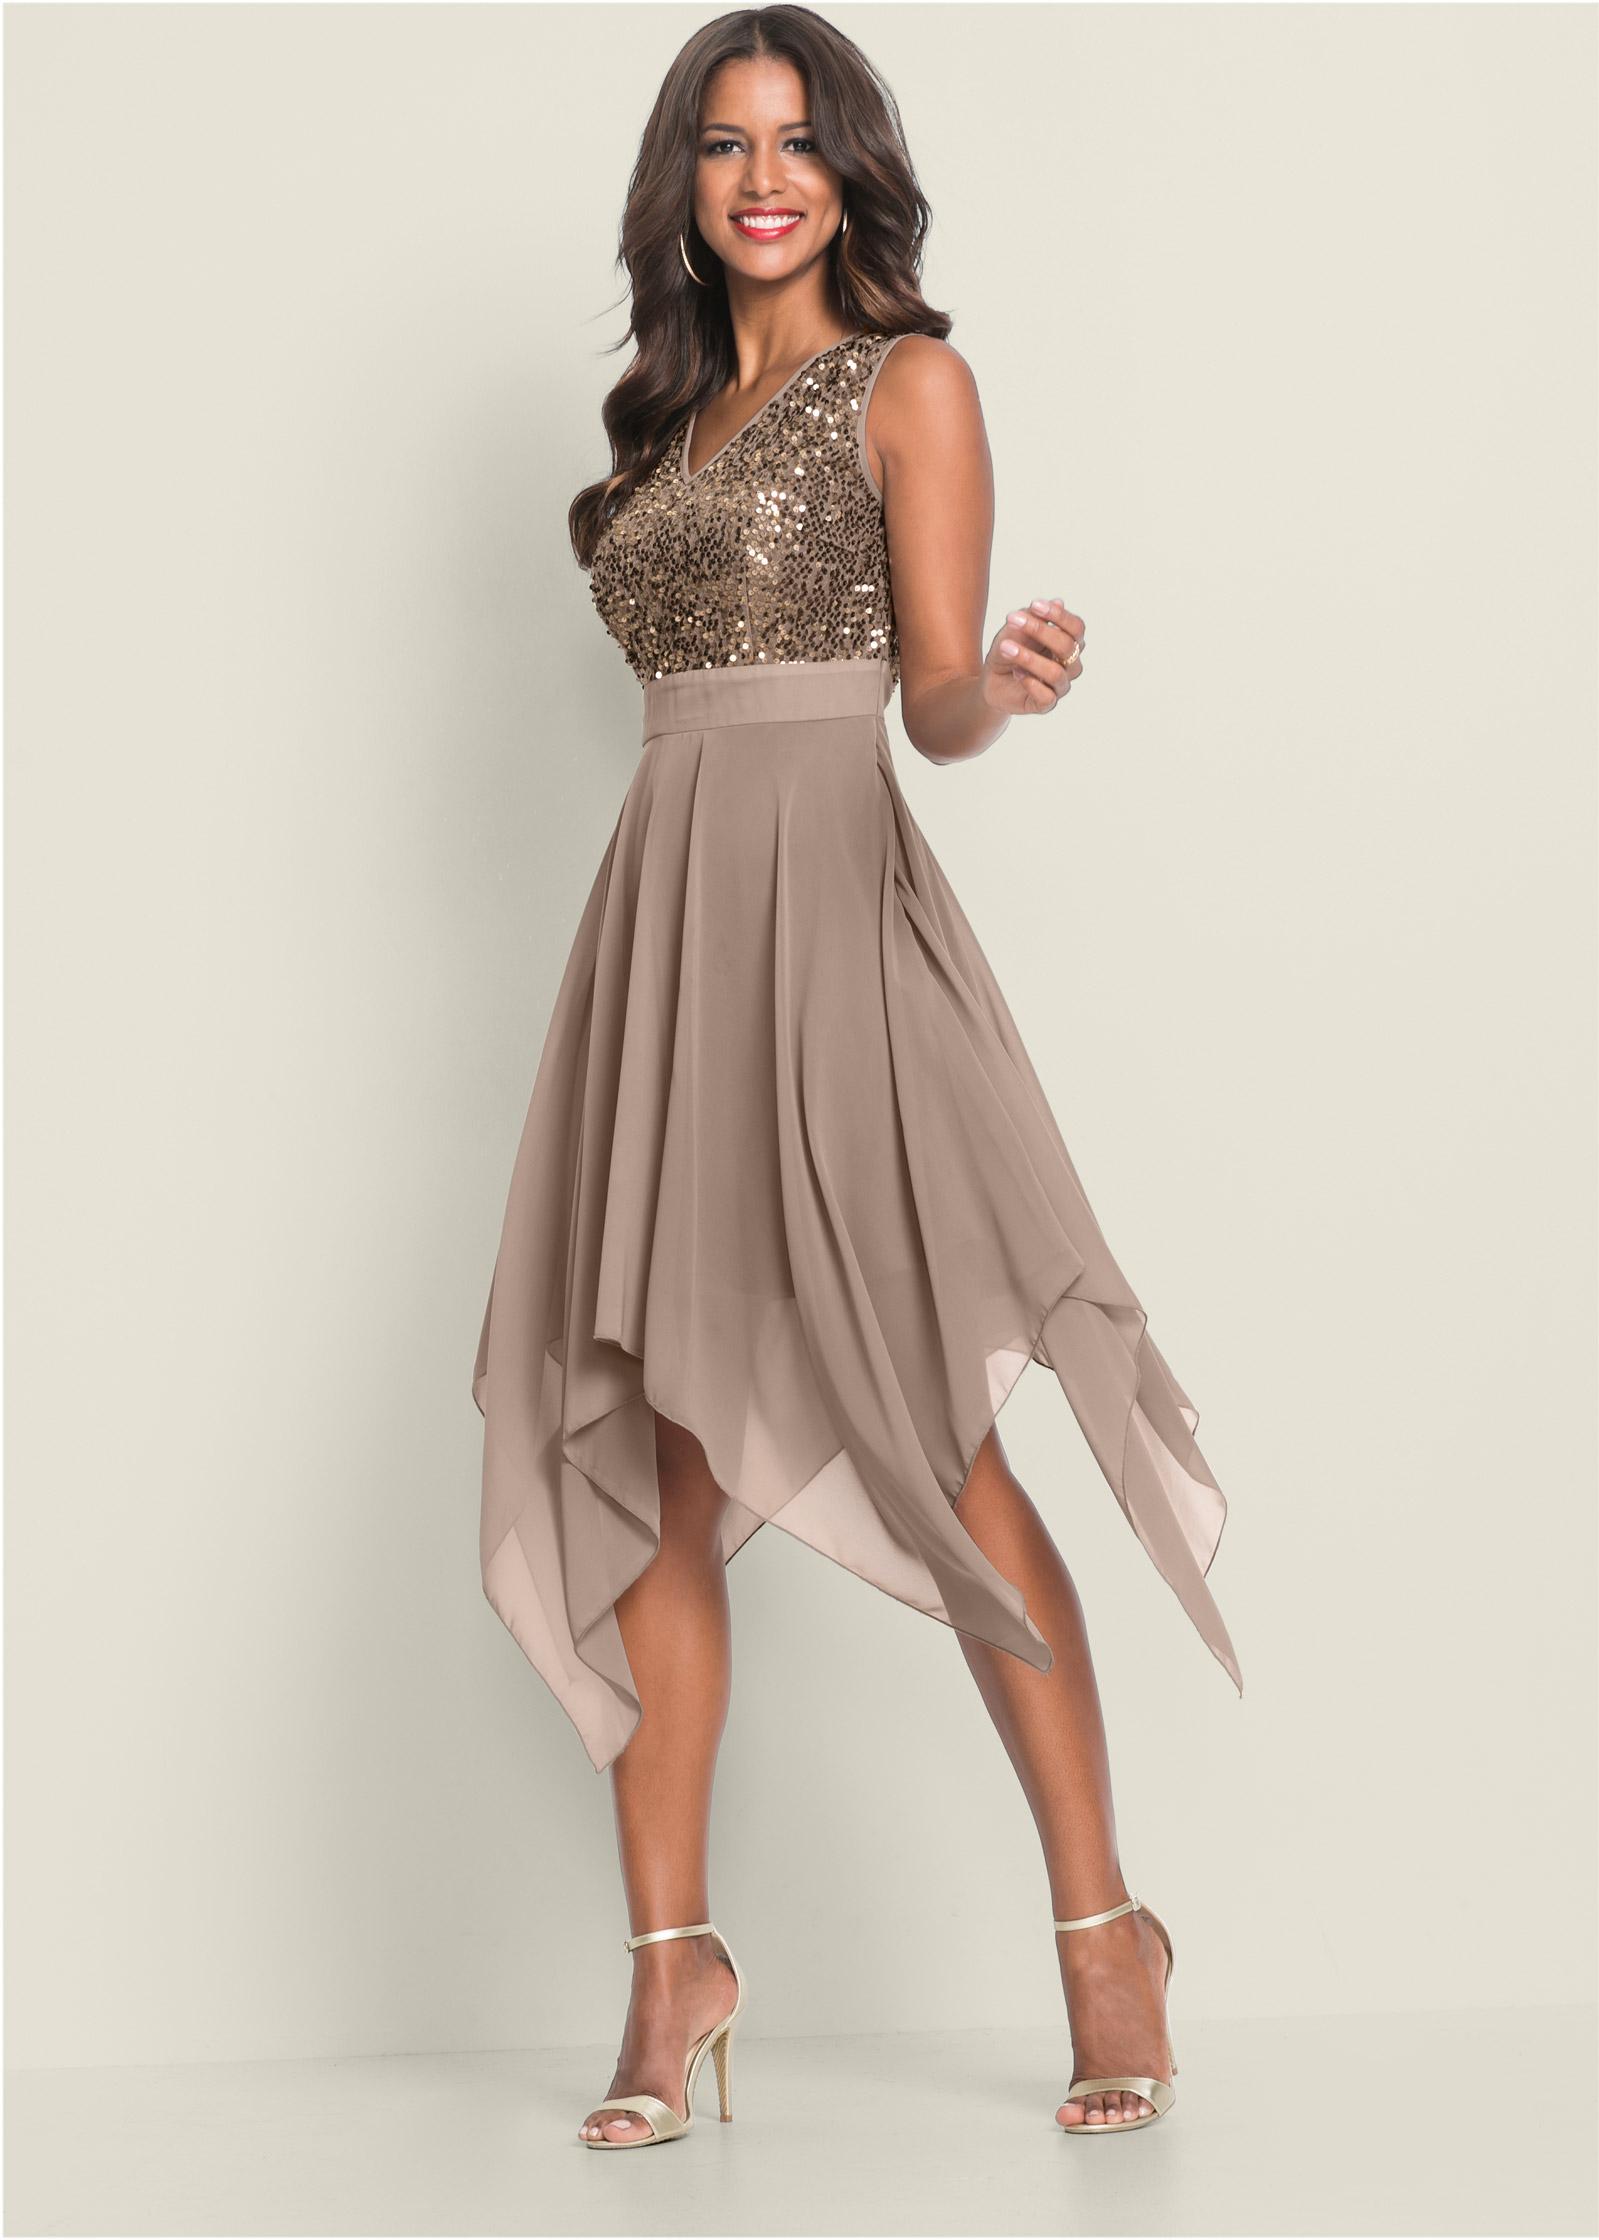 Plus Size Tops Venus Clothing